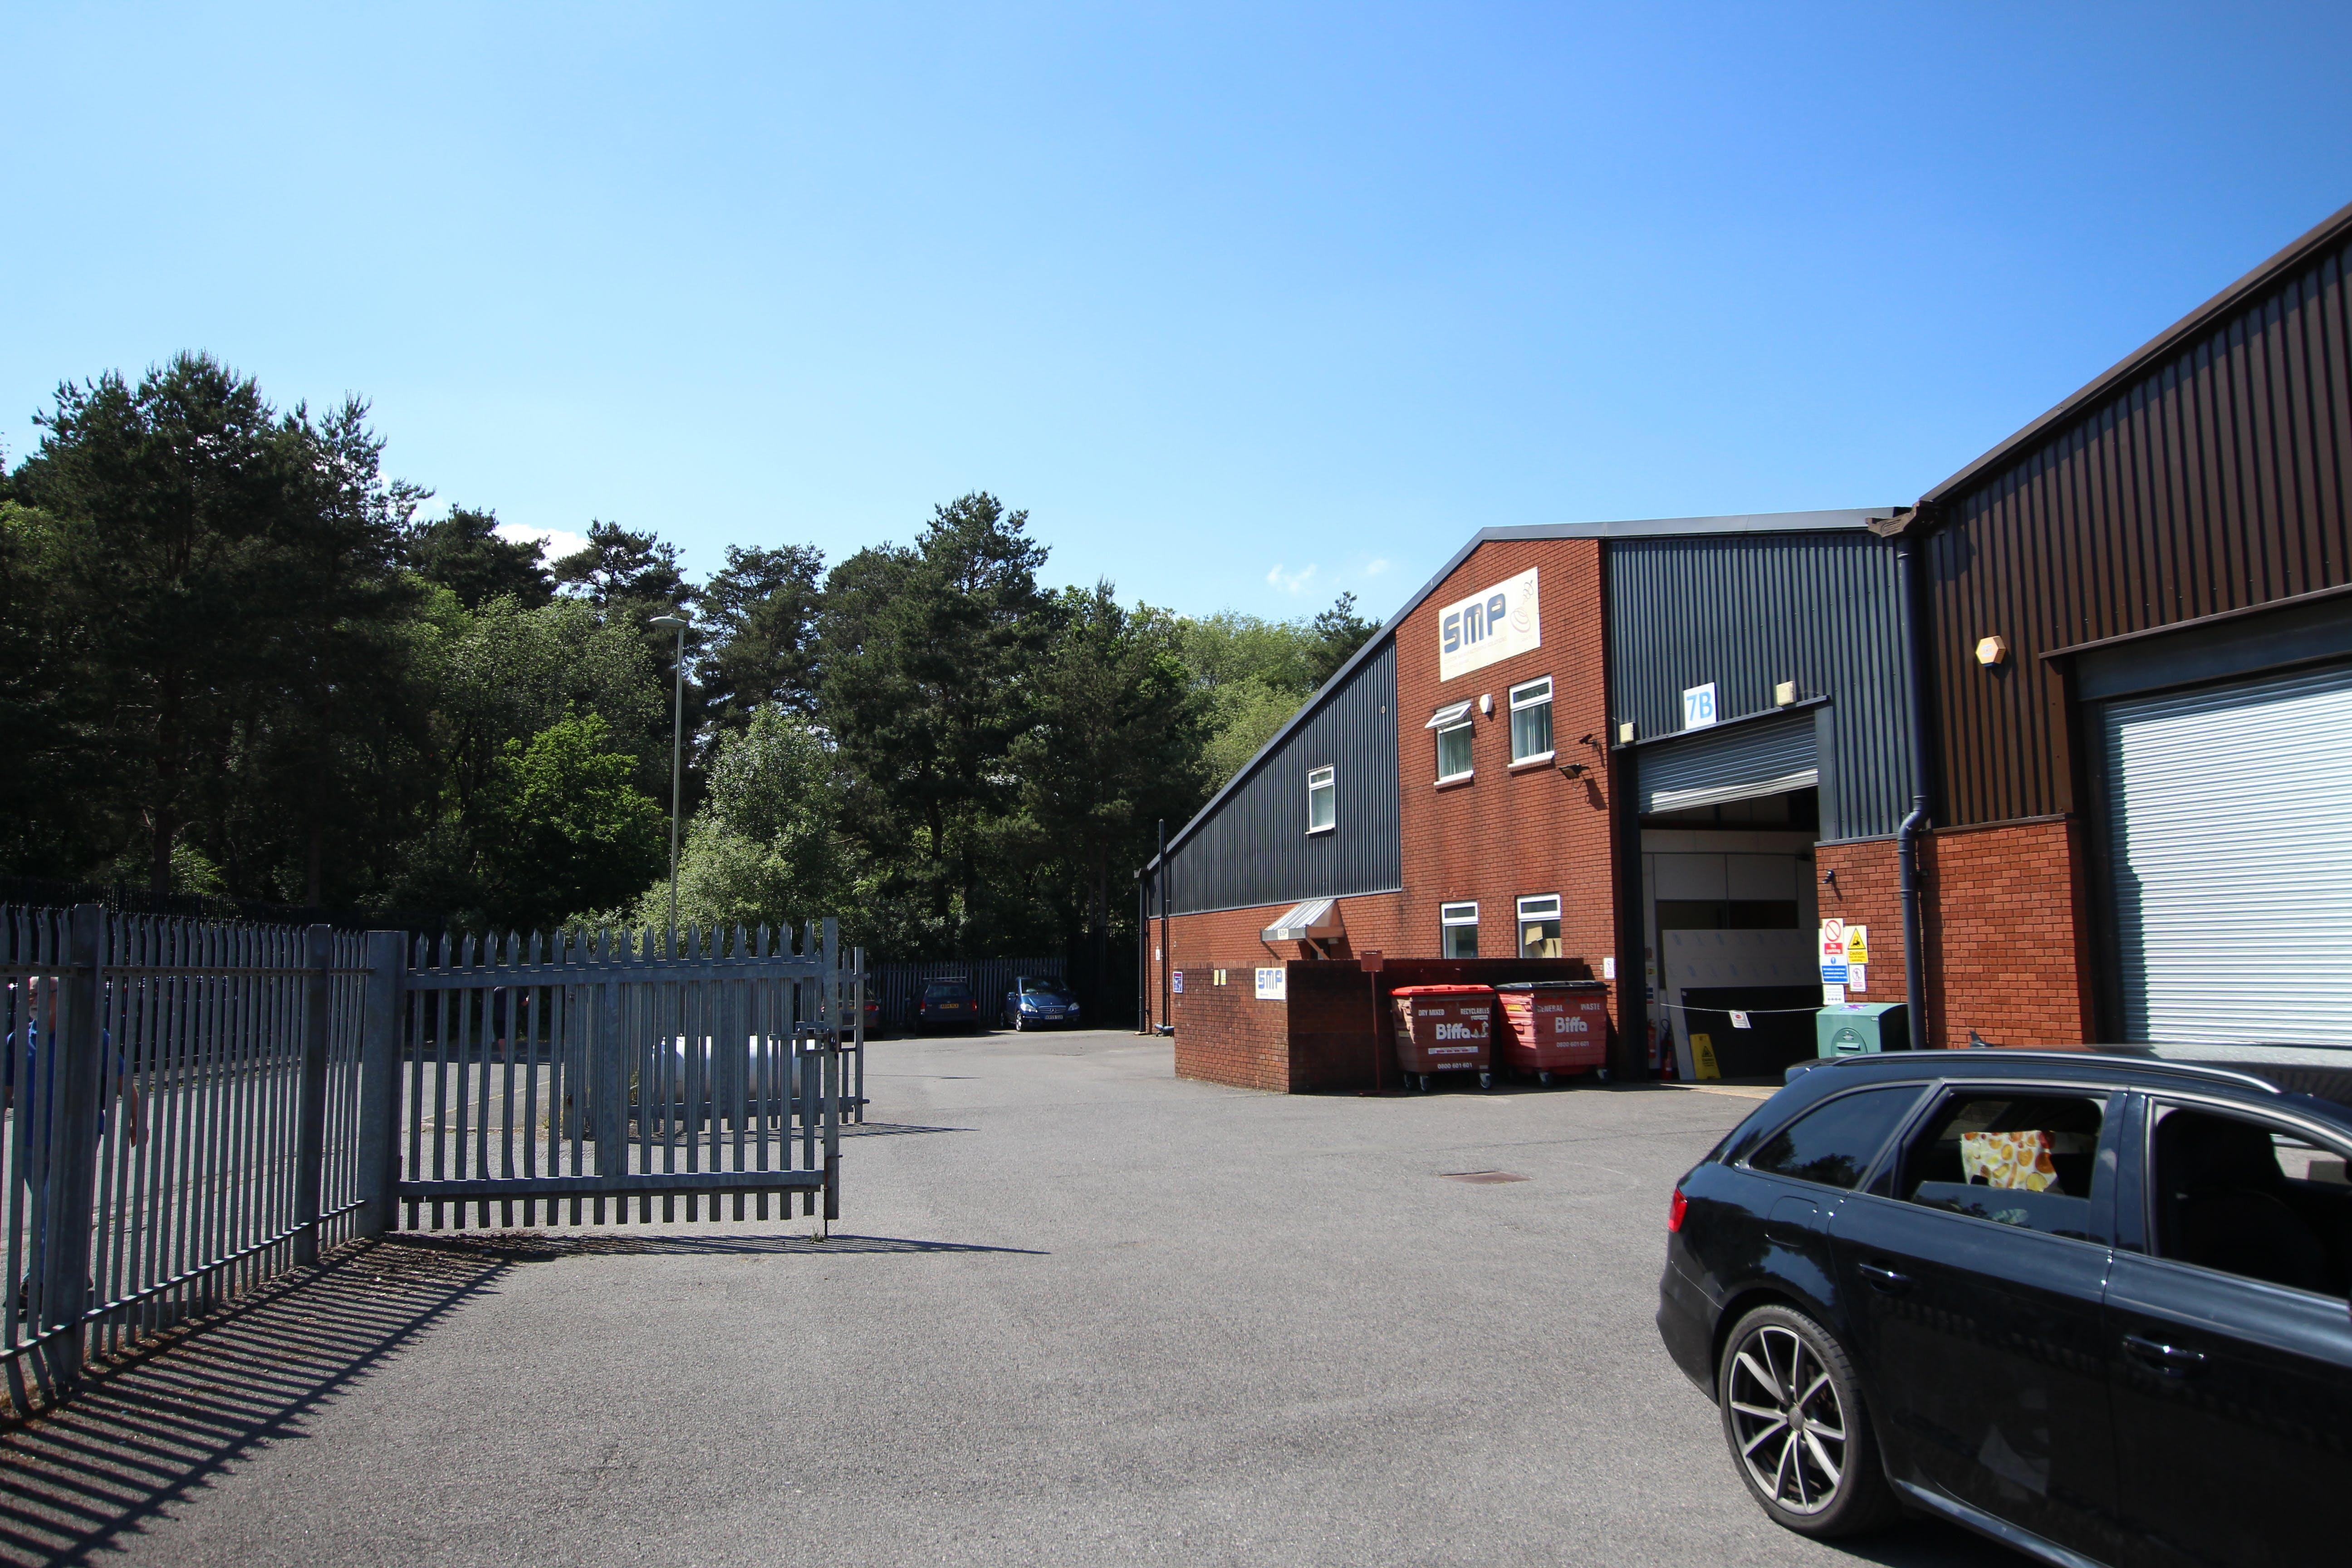 7B Woolmer Trading Estate, Bordon, Warehouse & Industrial To Let - IMG_1566.JPG